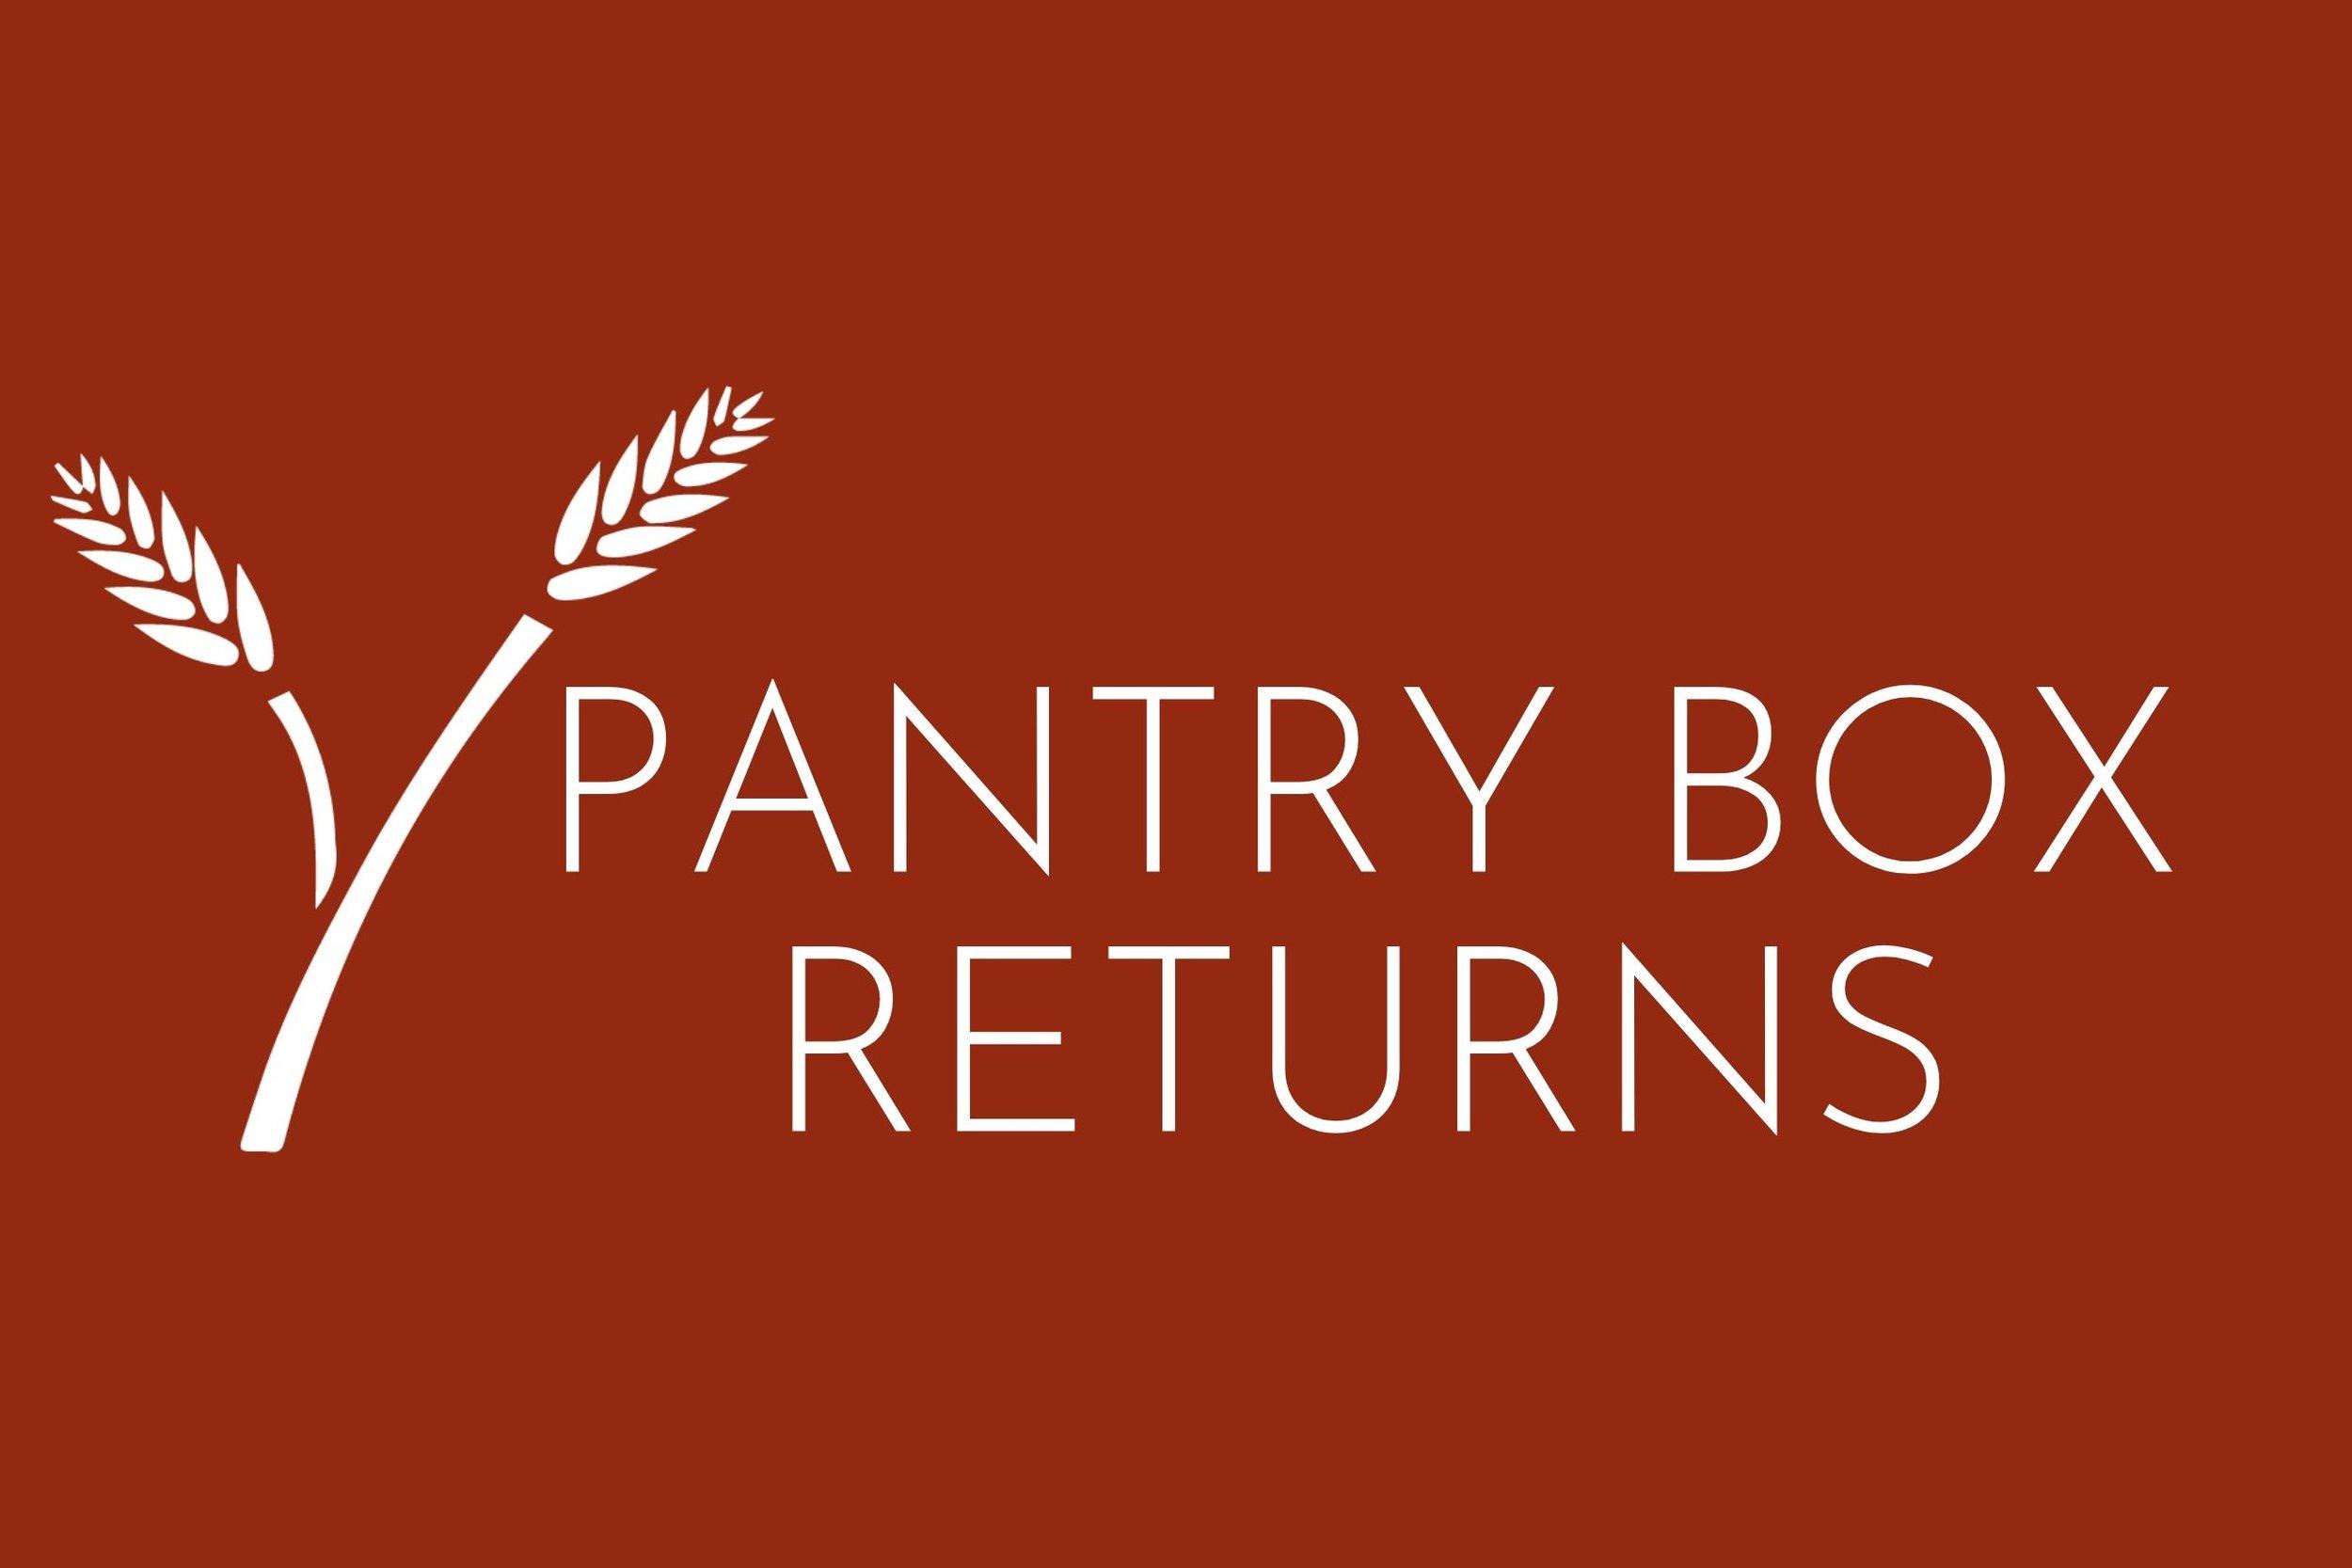 Pantry Box Returns